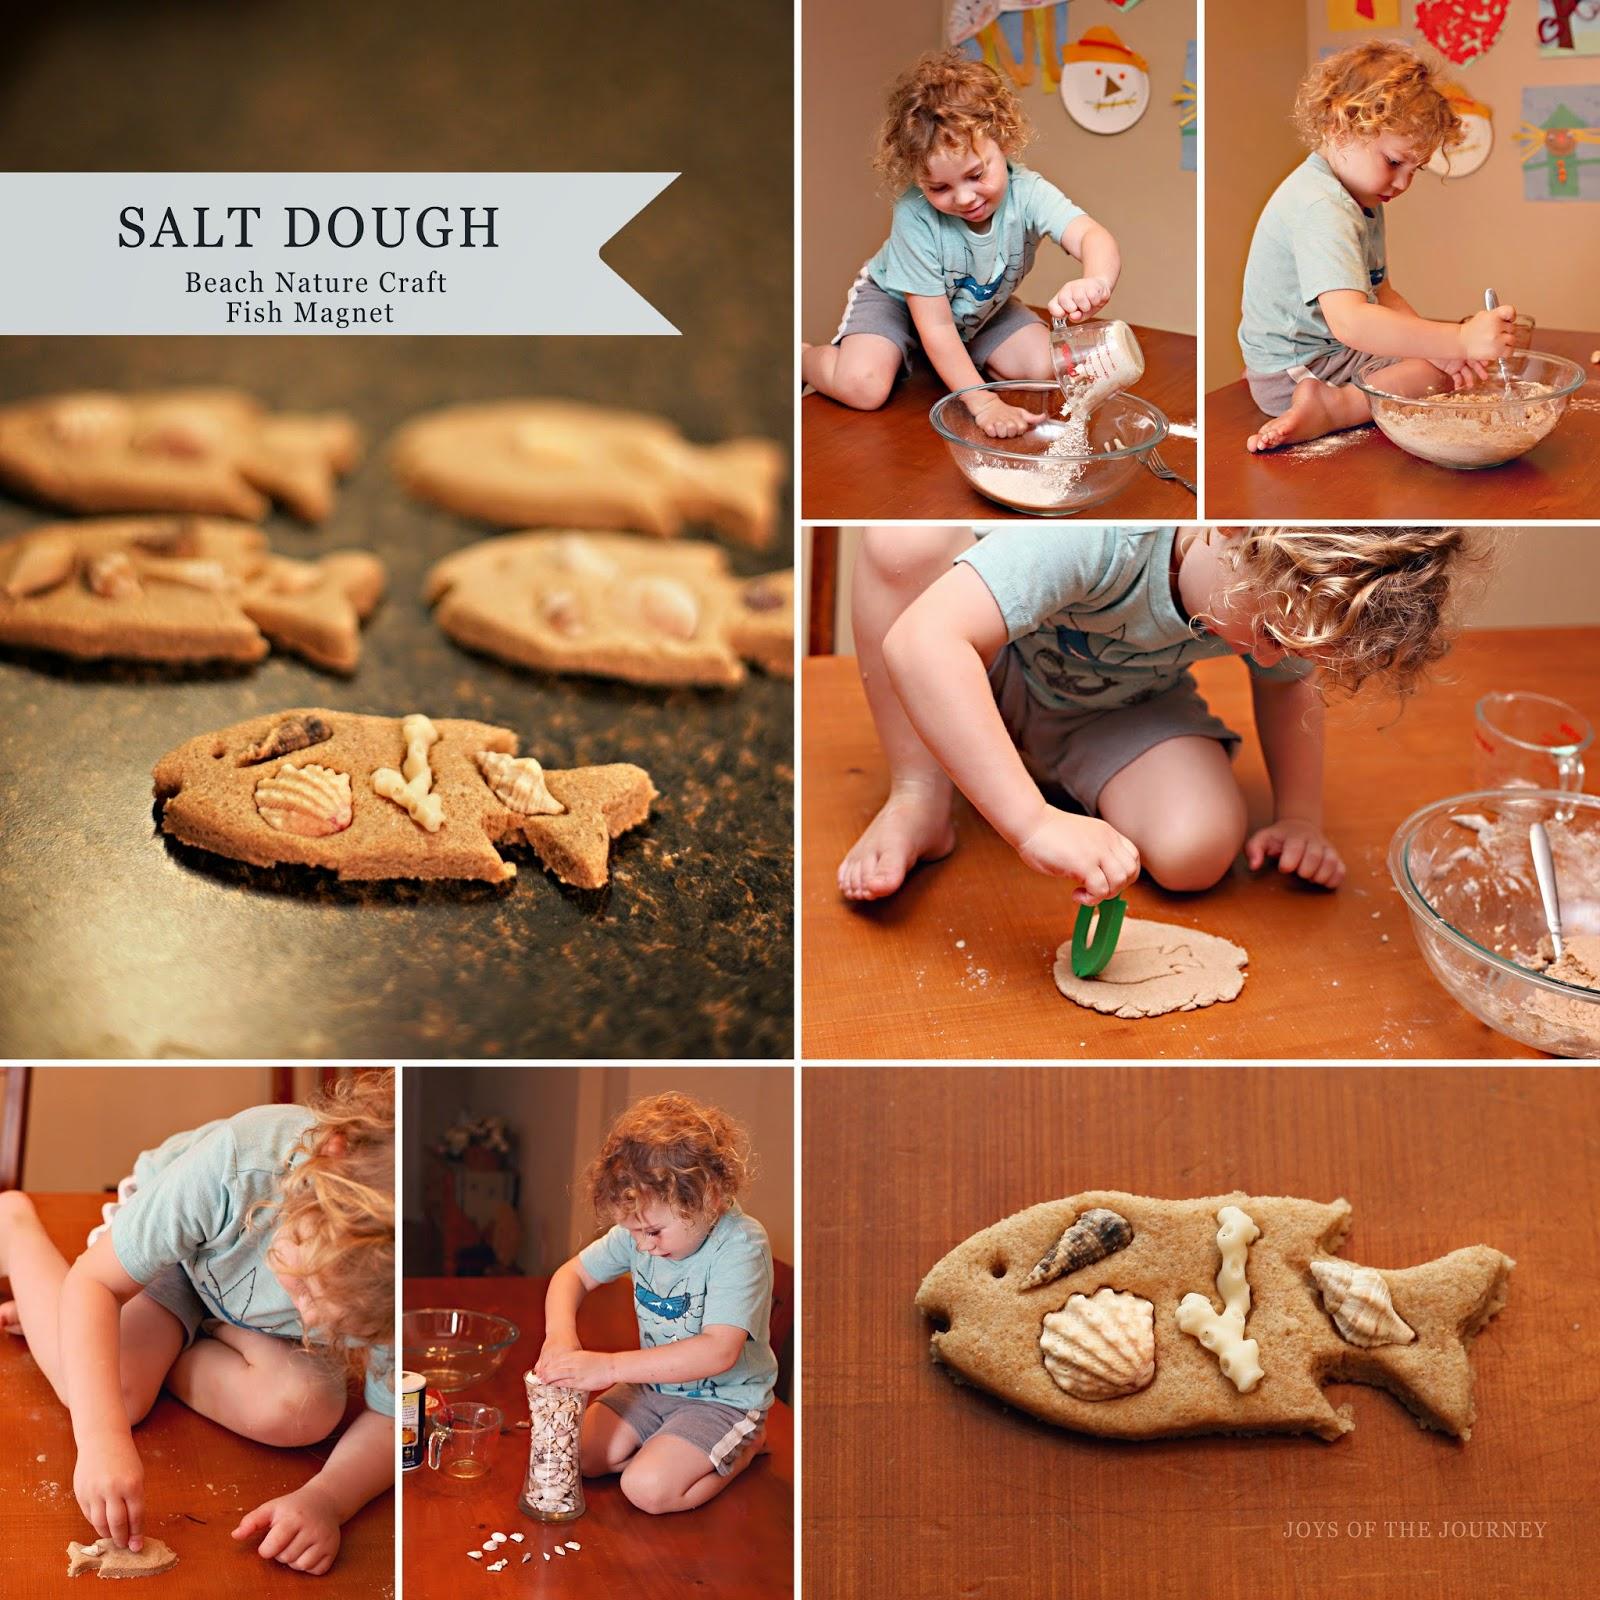 Joys of the journey nature salt dough craft for Salt dough crafts figures